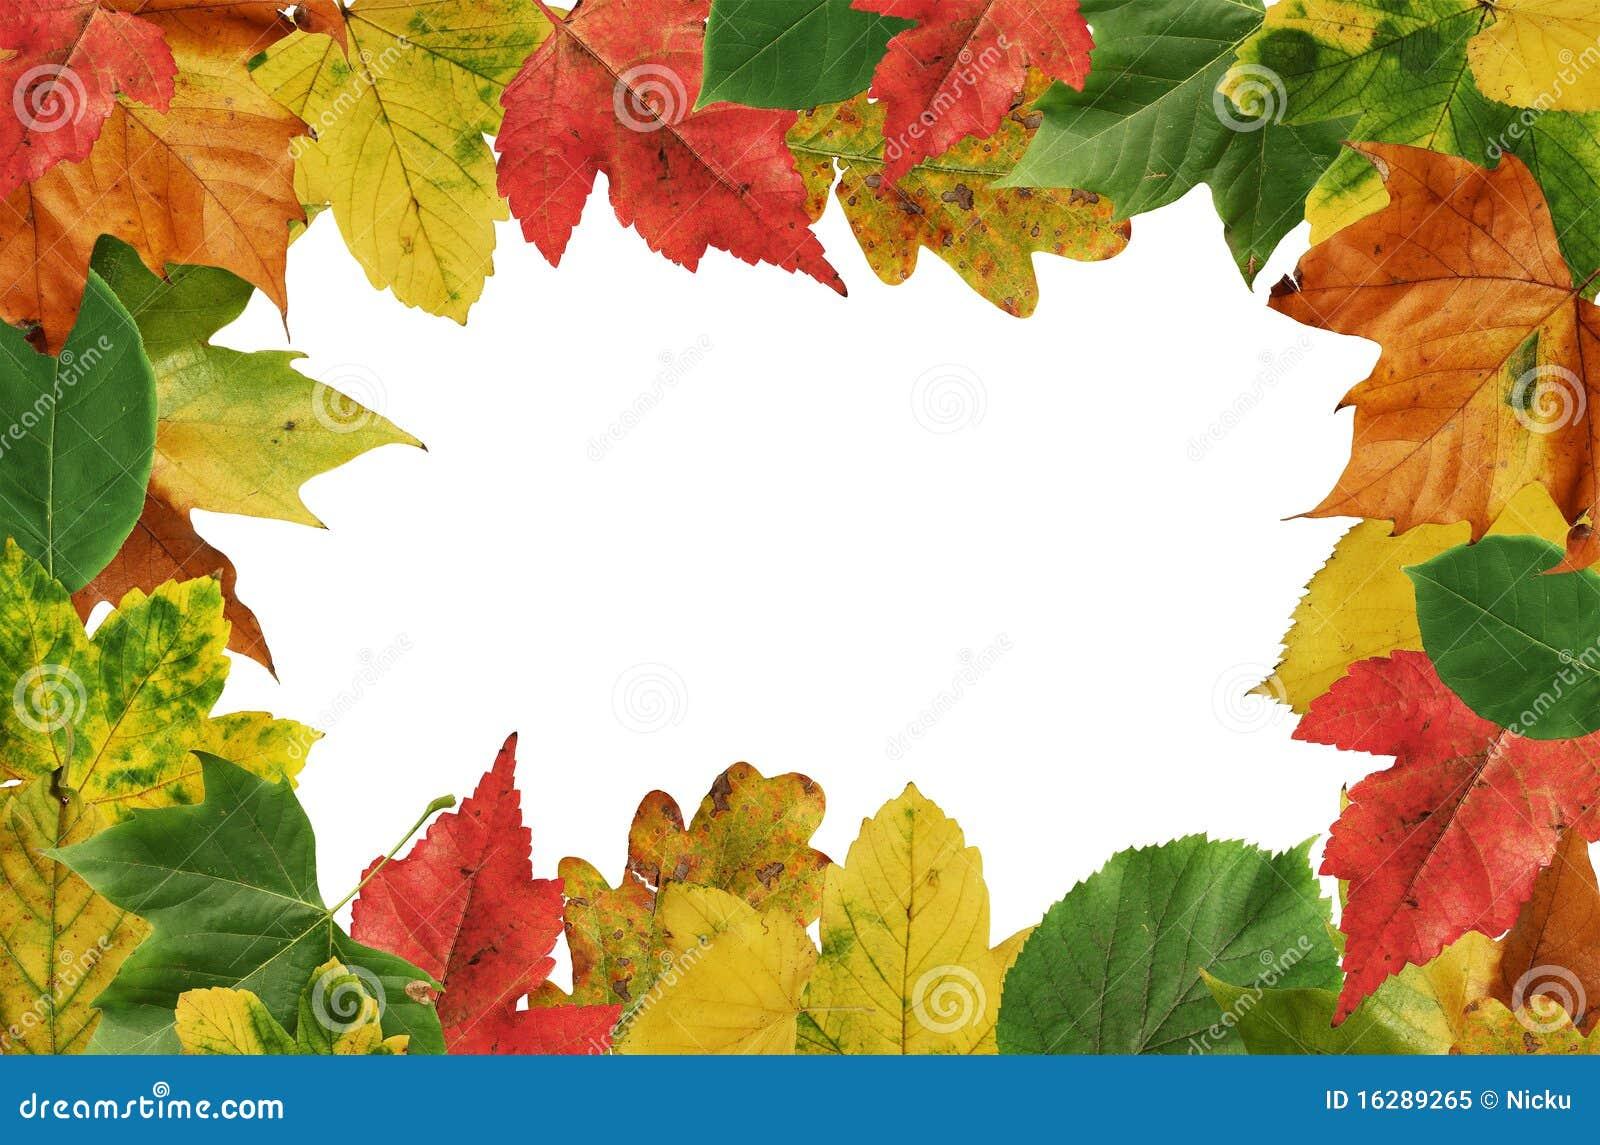 Autumn leafs frame